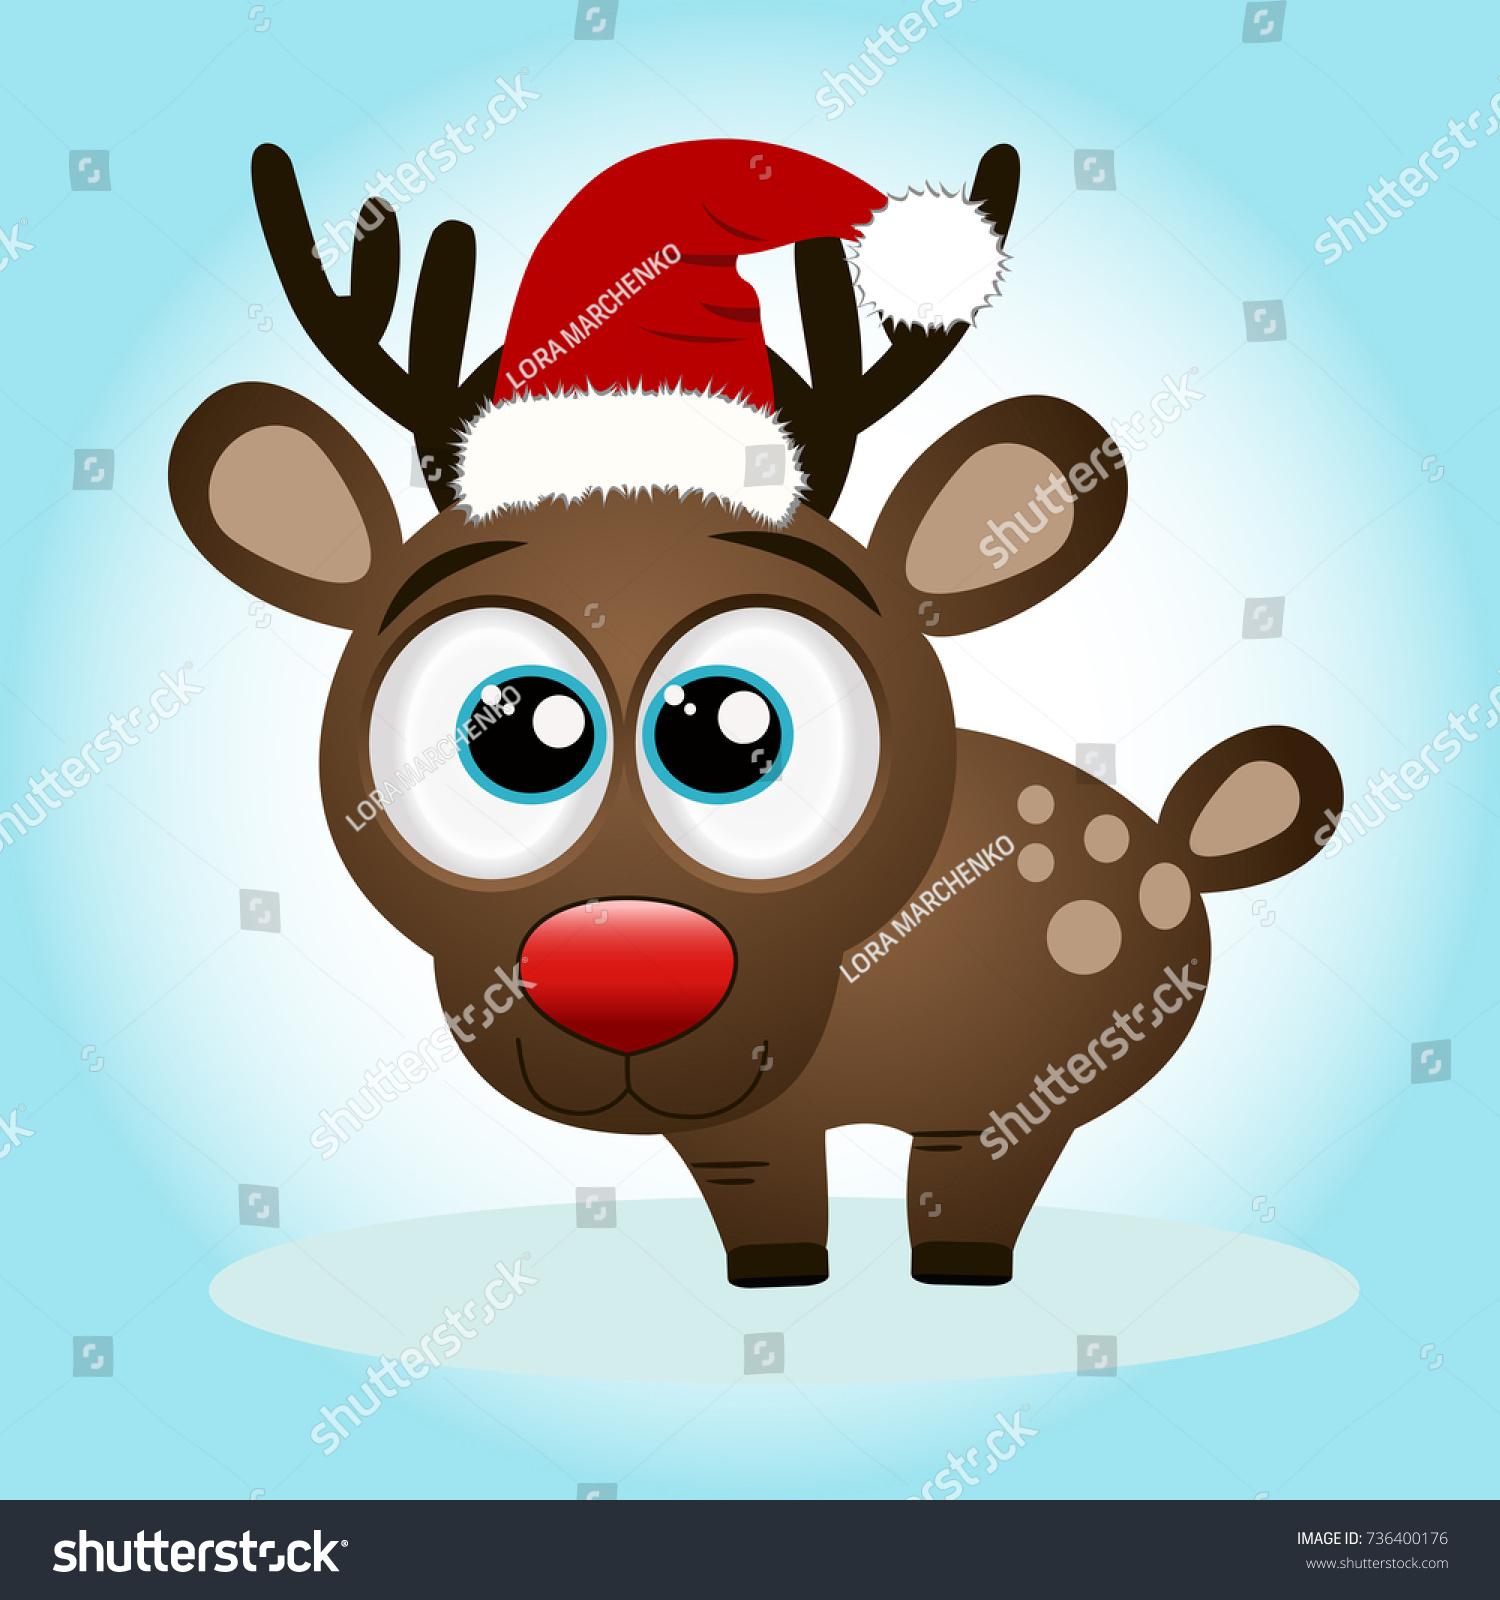 Christmas Reindeer Christmas Card Funny Reindeer Stock Vector ...